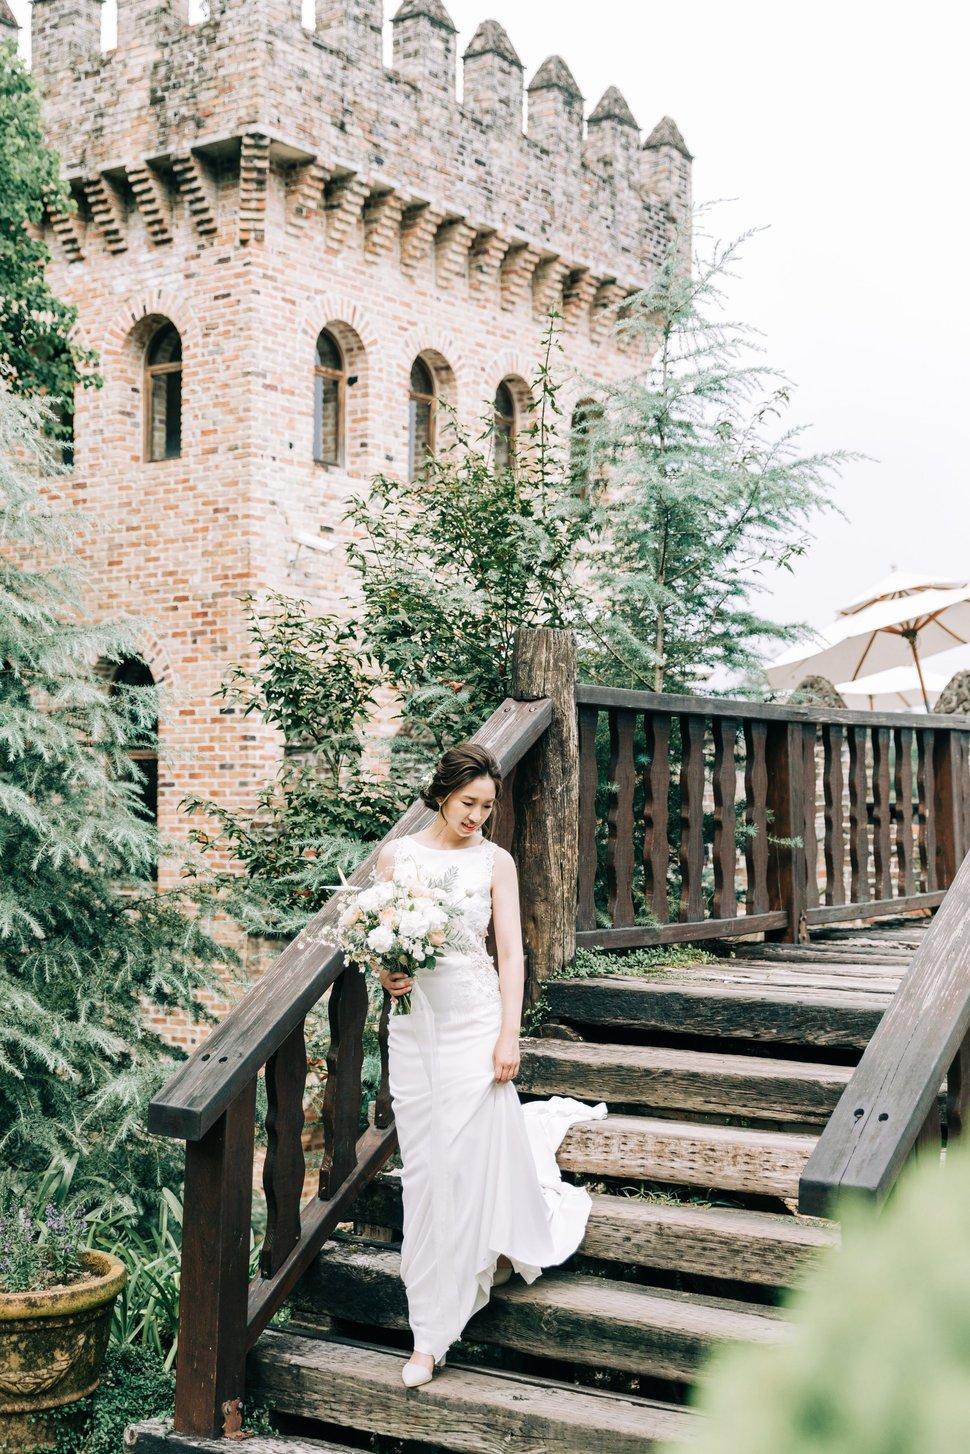 AG4_4326A - Cradle Wedding搖籃手工婚紗《結婚吧》